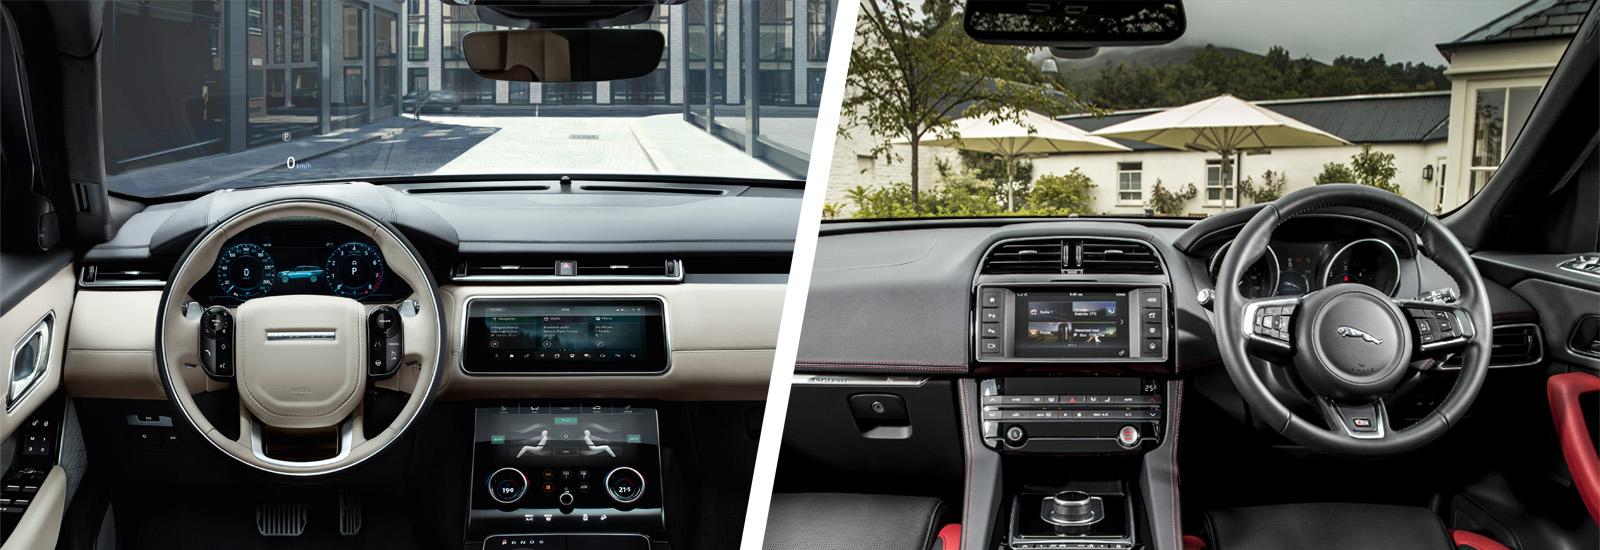 2018 jaguar f pace interior. simple 2018 range rover velar vs jaguar fpace interior for 2018 jaguar f pace